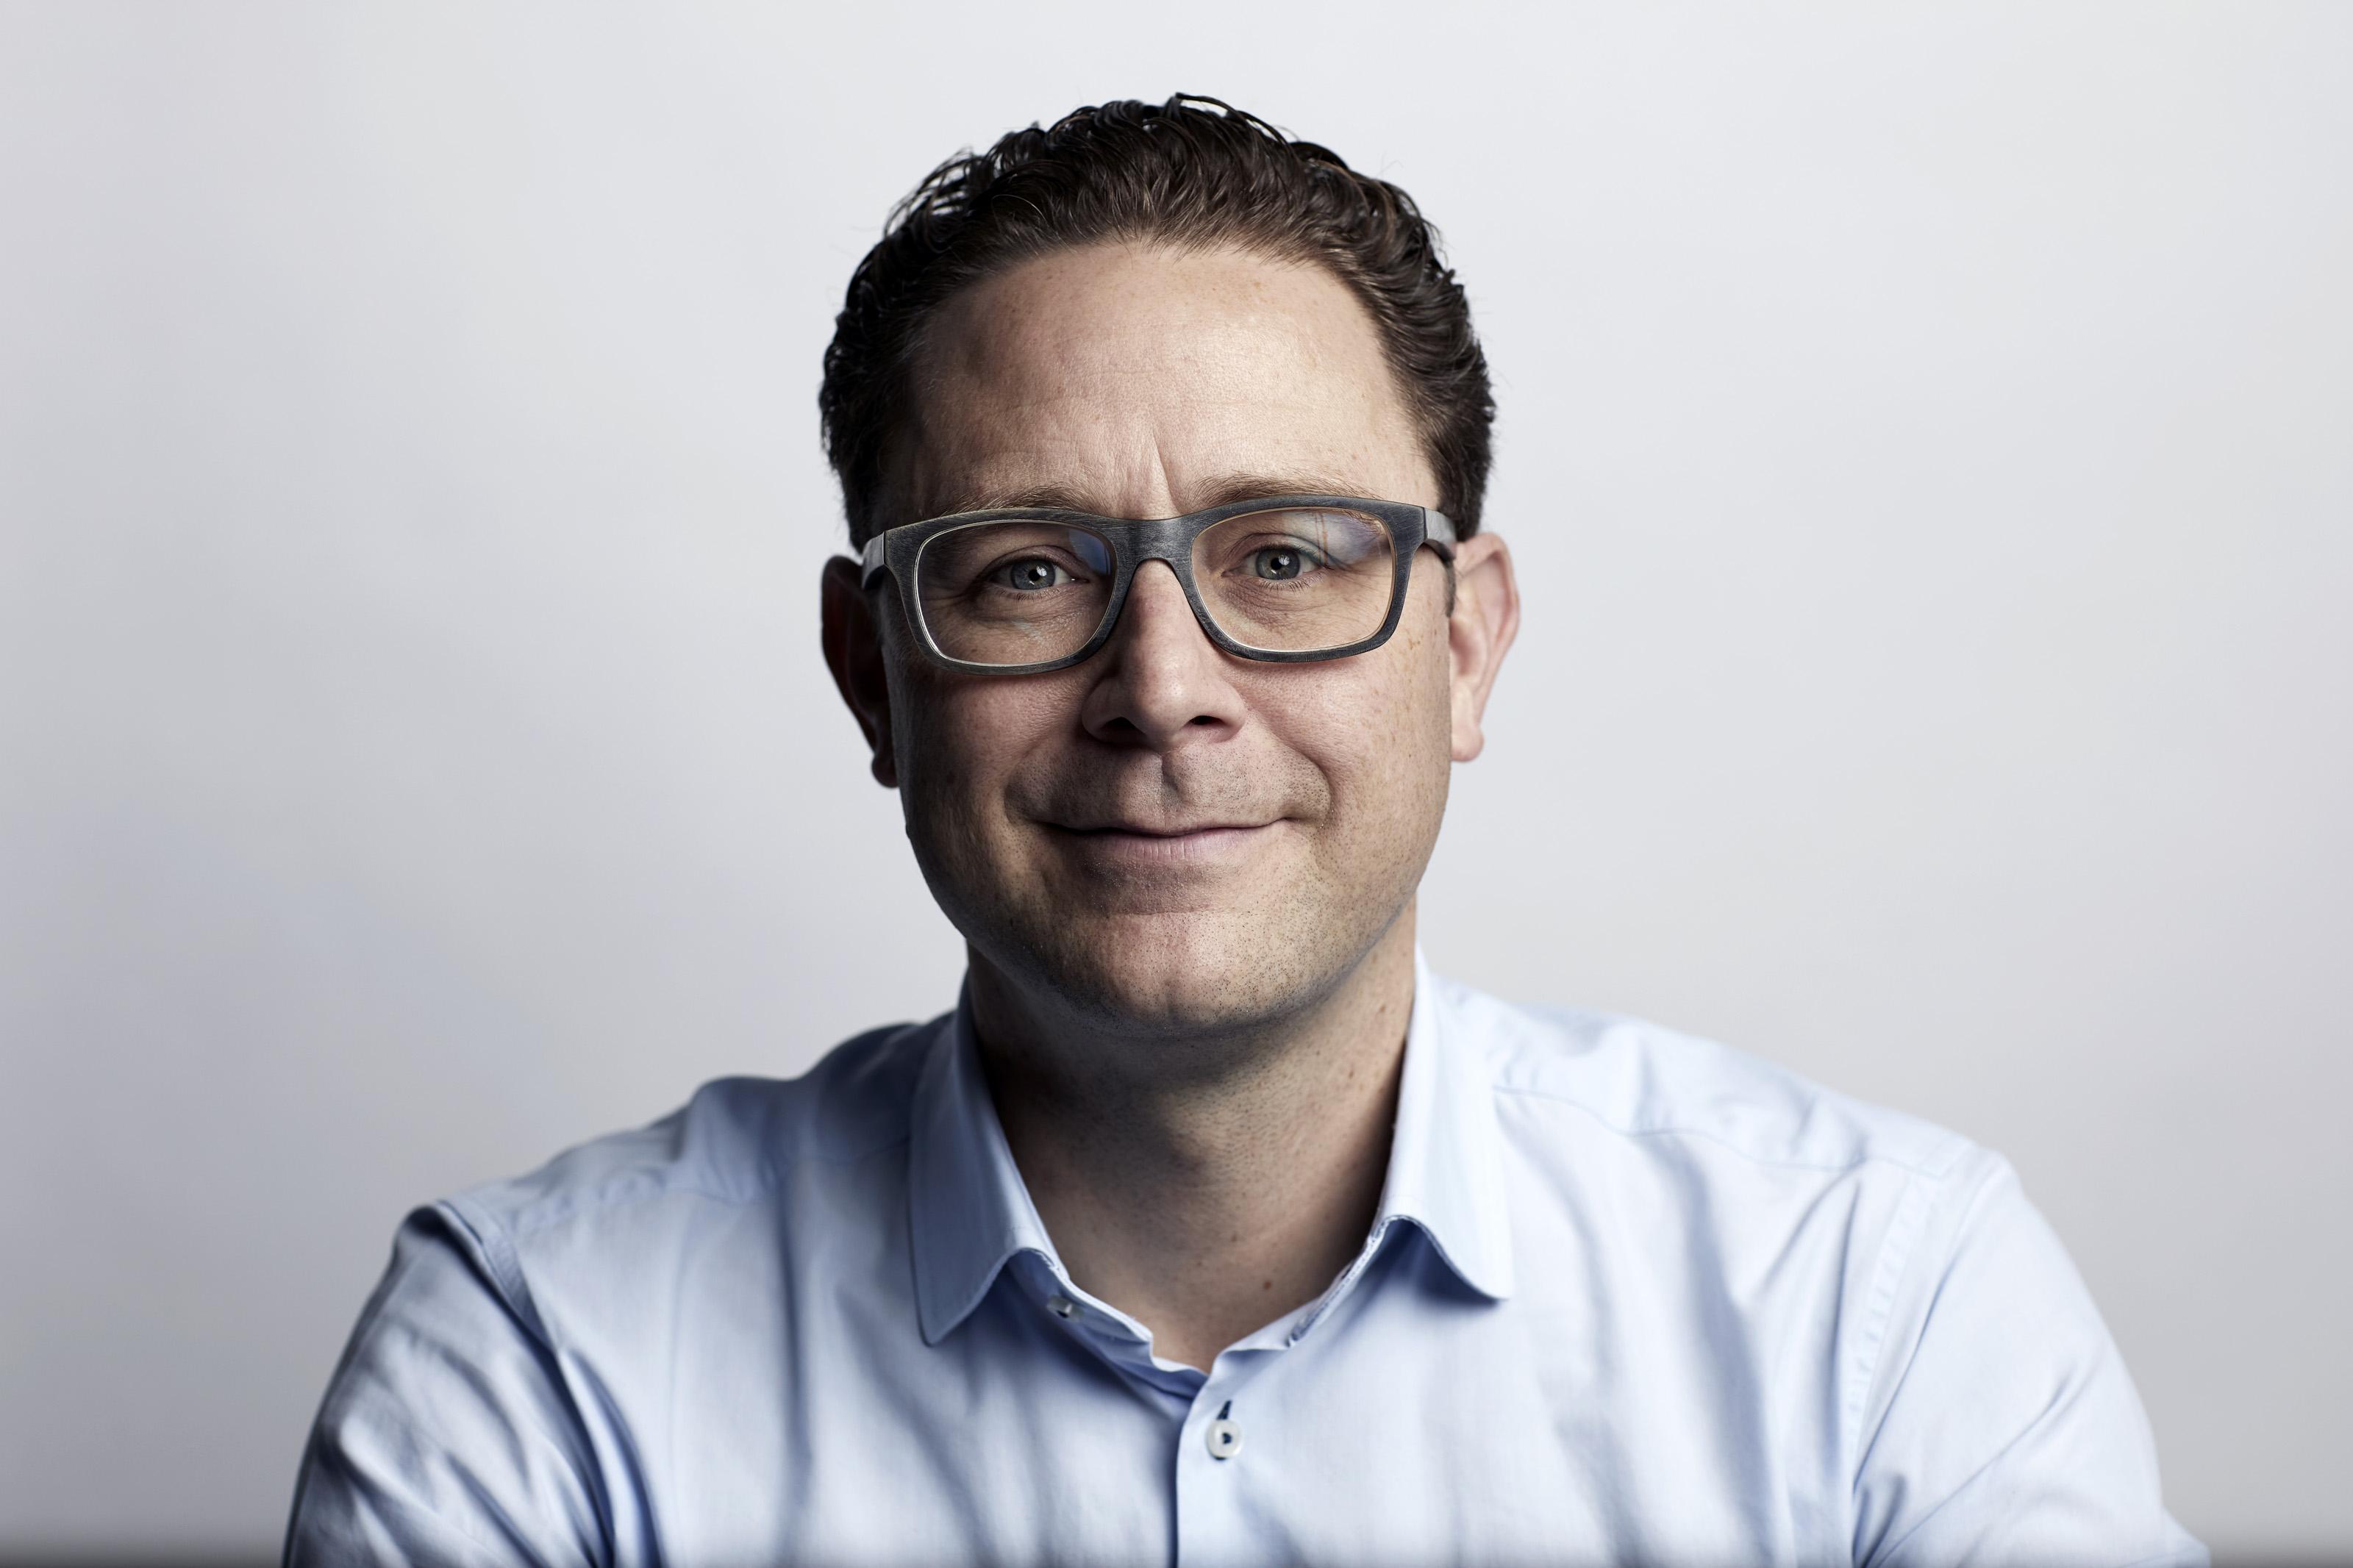 Drei Fragen an Thomas Eiele | CEO Food Service